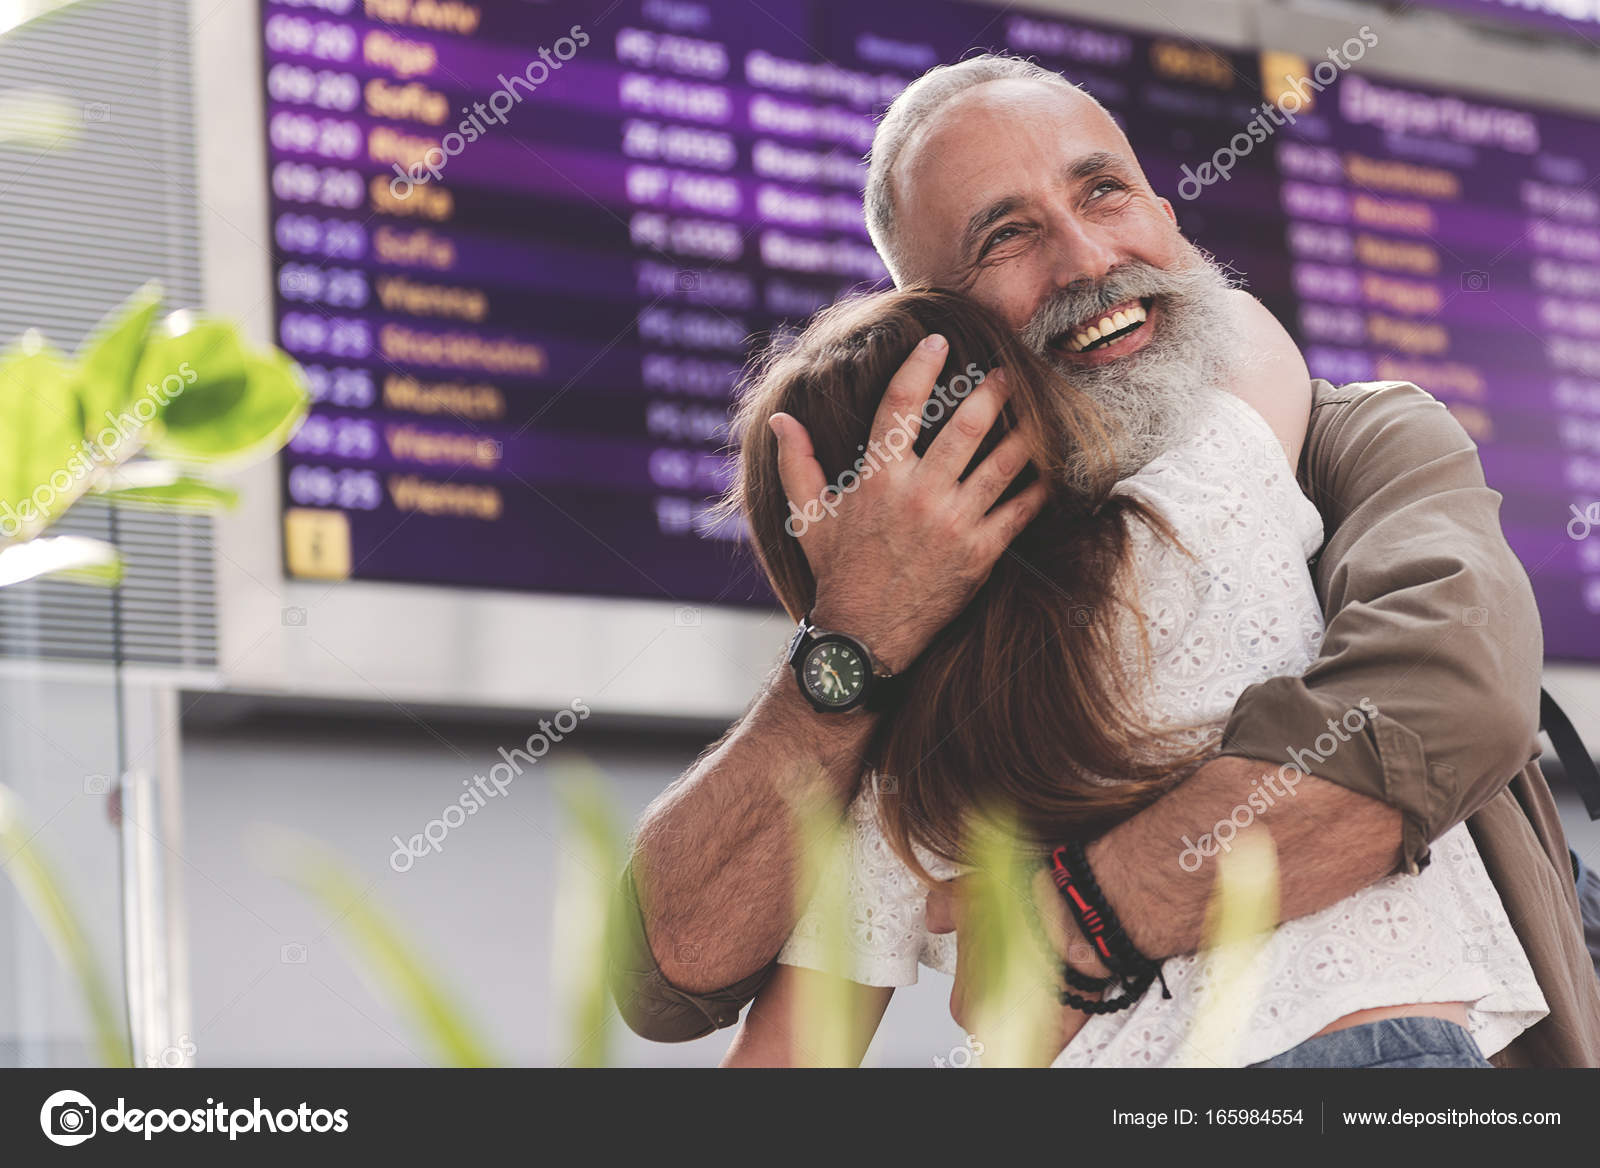 old man kissing girl